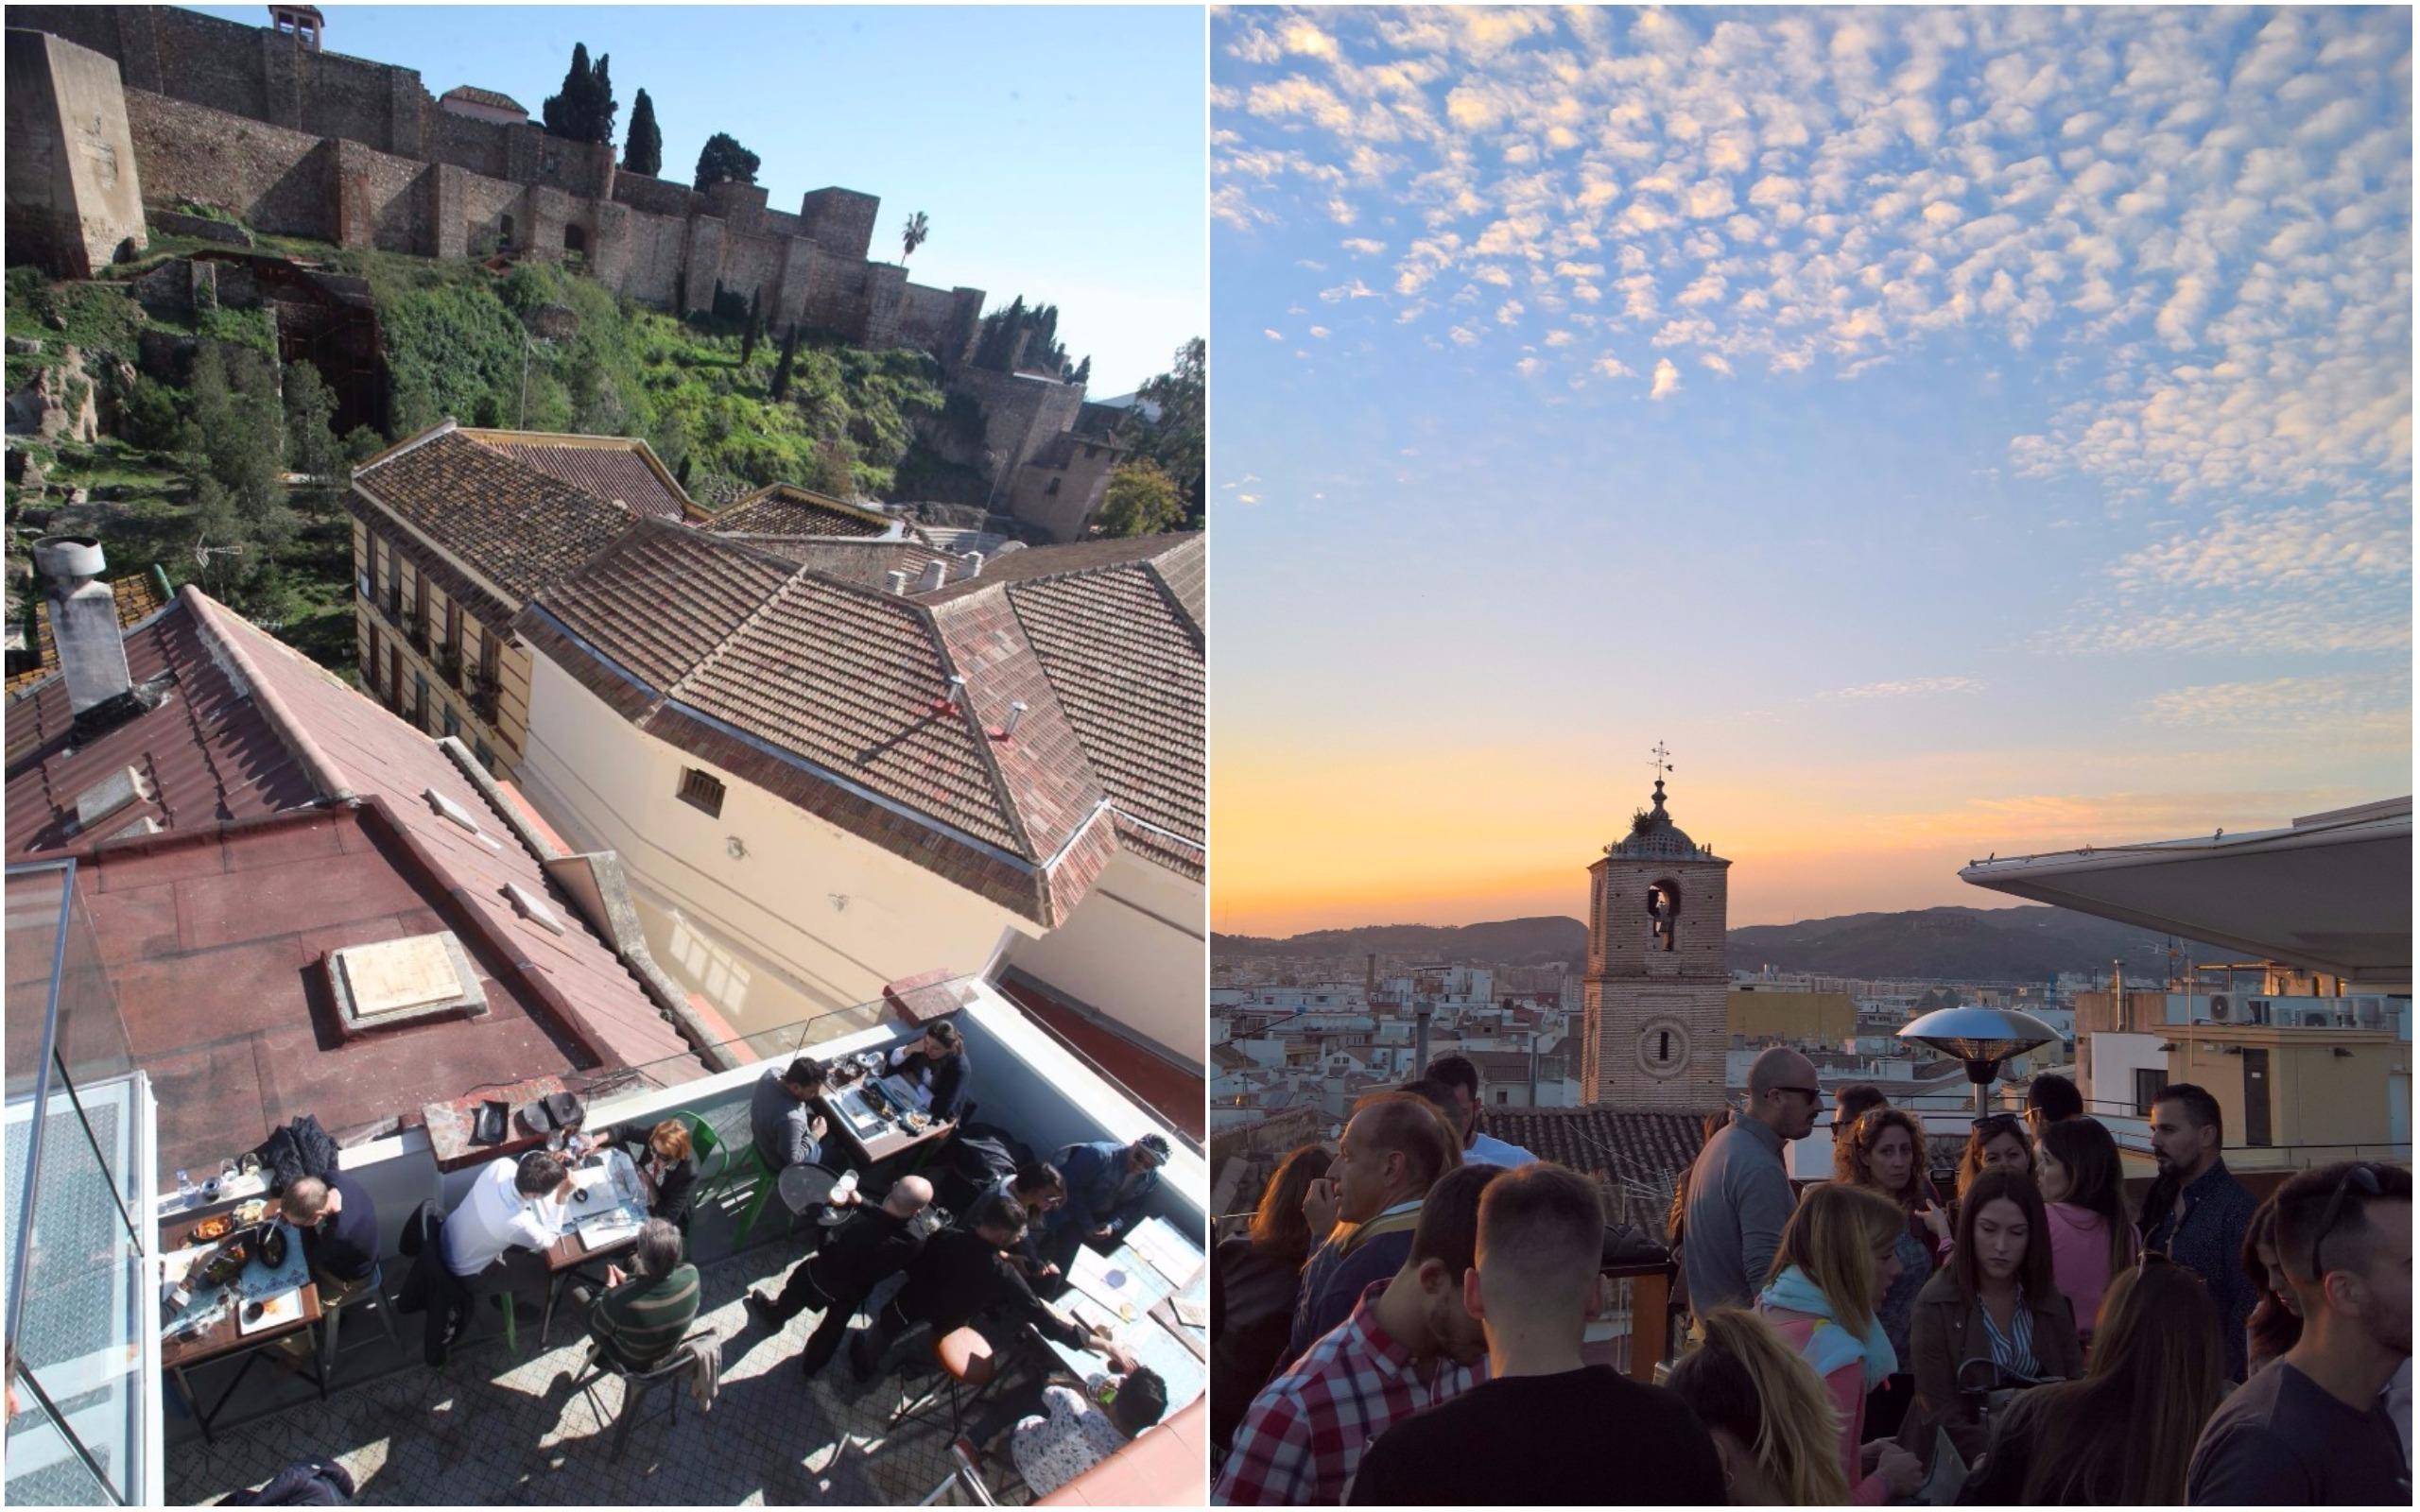 Alcazaba Premium Hostel - Where to Stay in Malaga